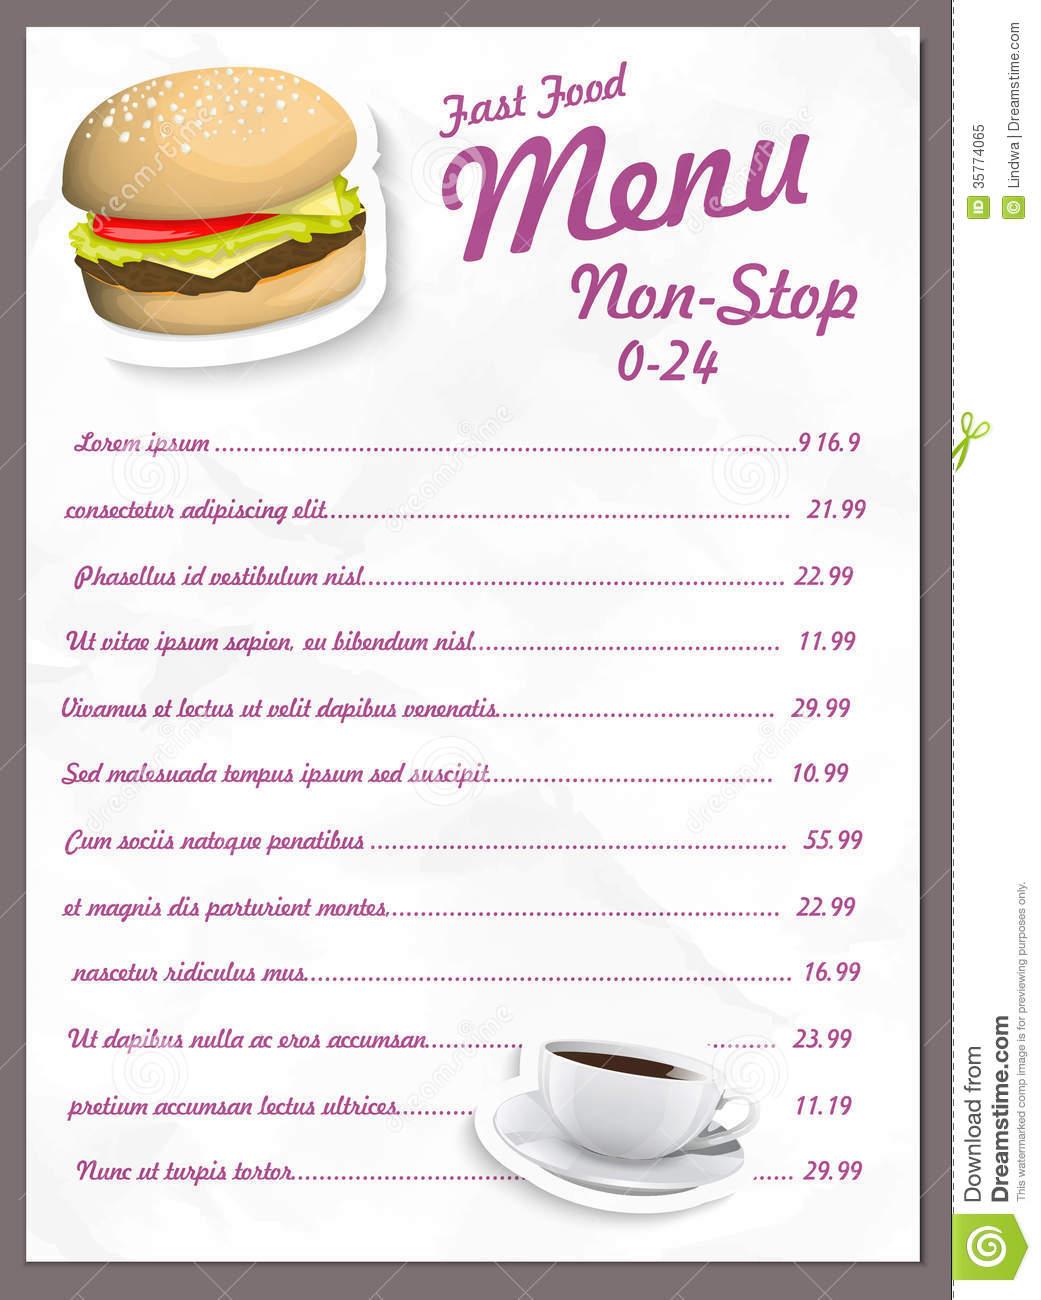 Fast Food Menus